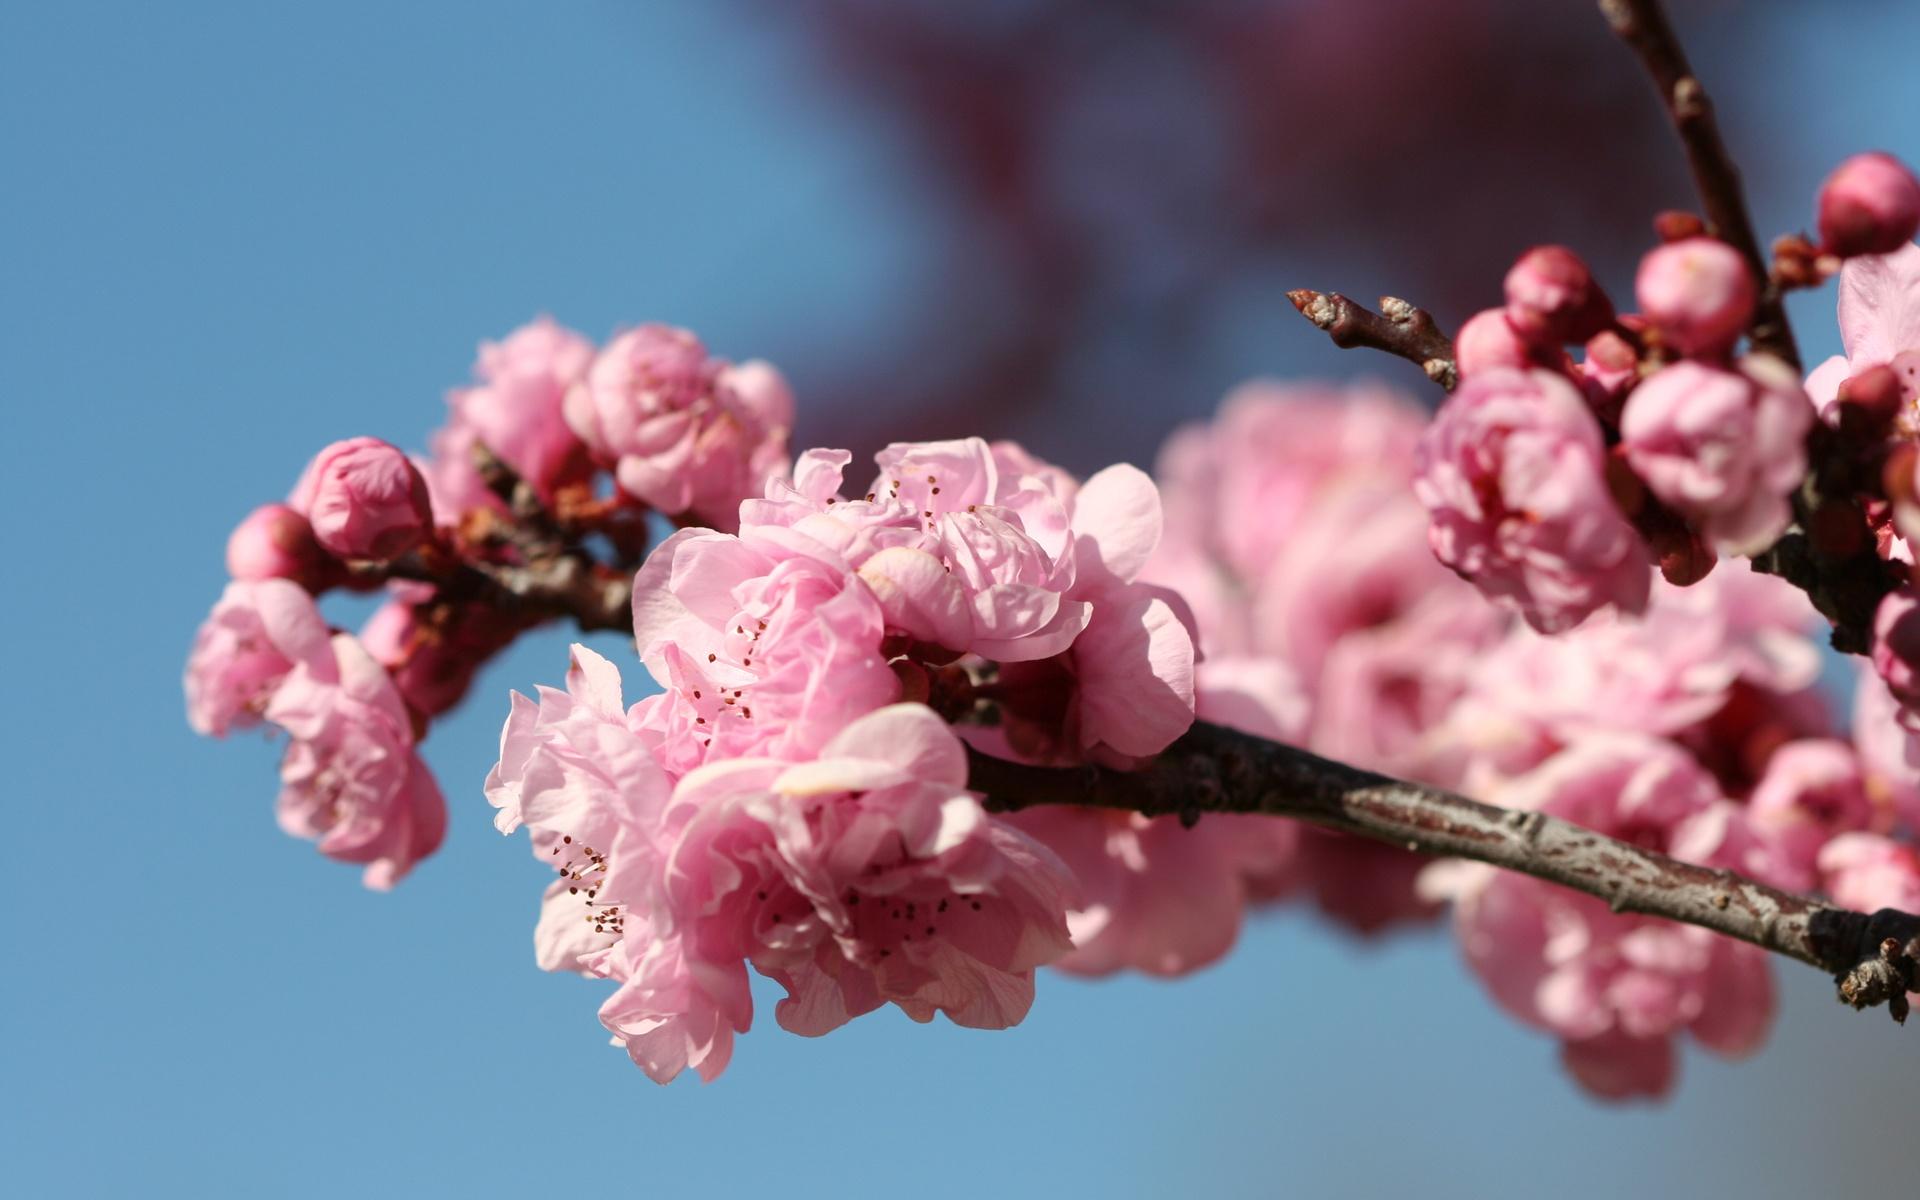 Cherry Blossom Facebook Cover wallpaper   849471 1920x1200